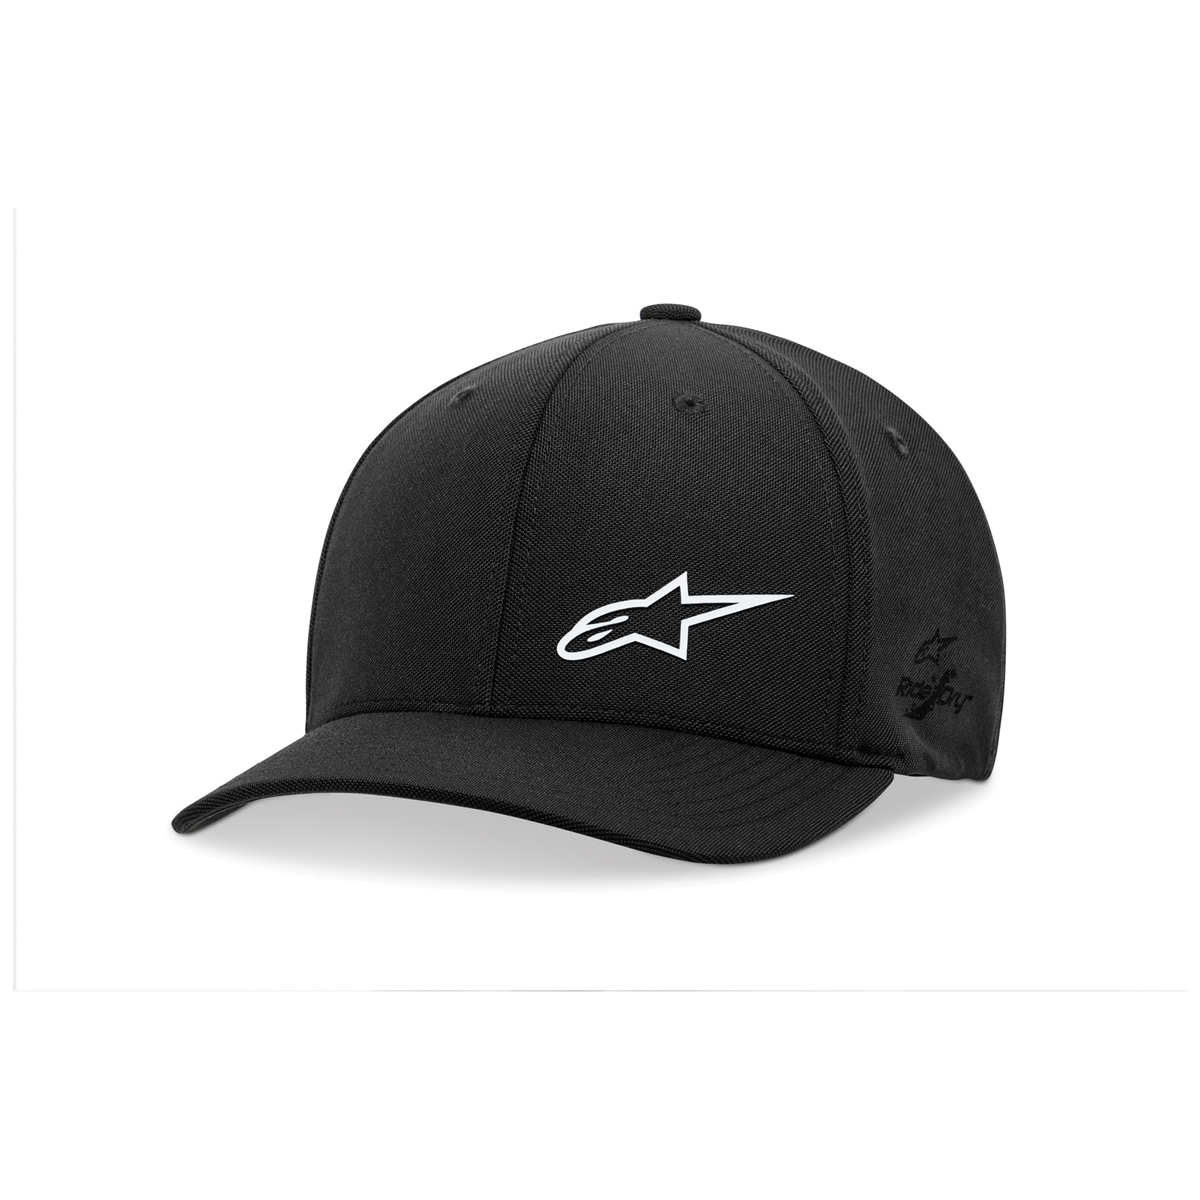 Alpinestars Asym Sonic Tech Black/White Curved Bill Hat